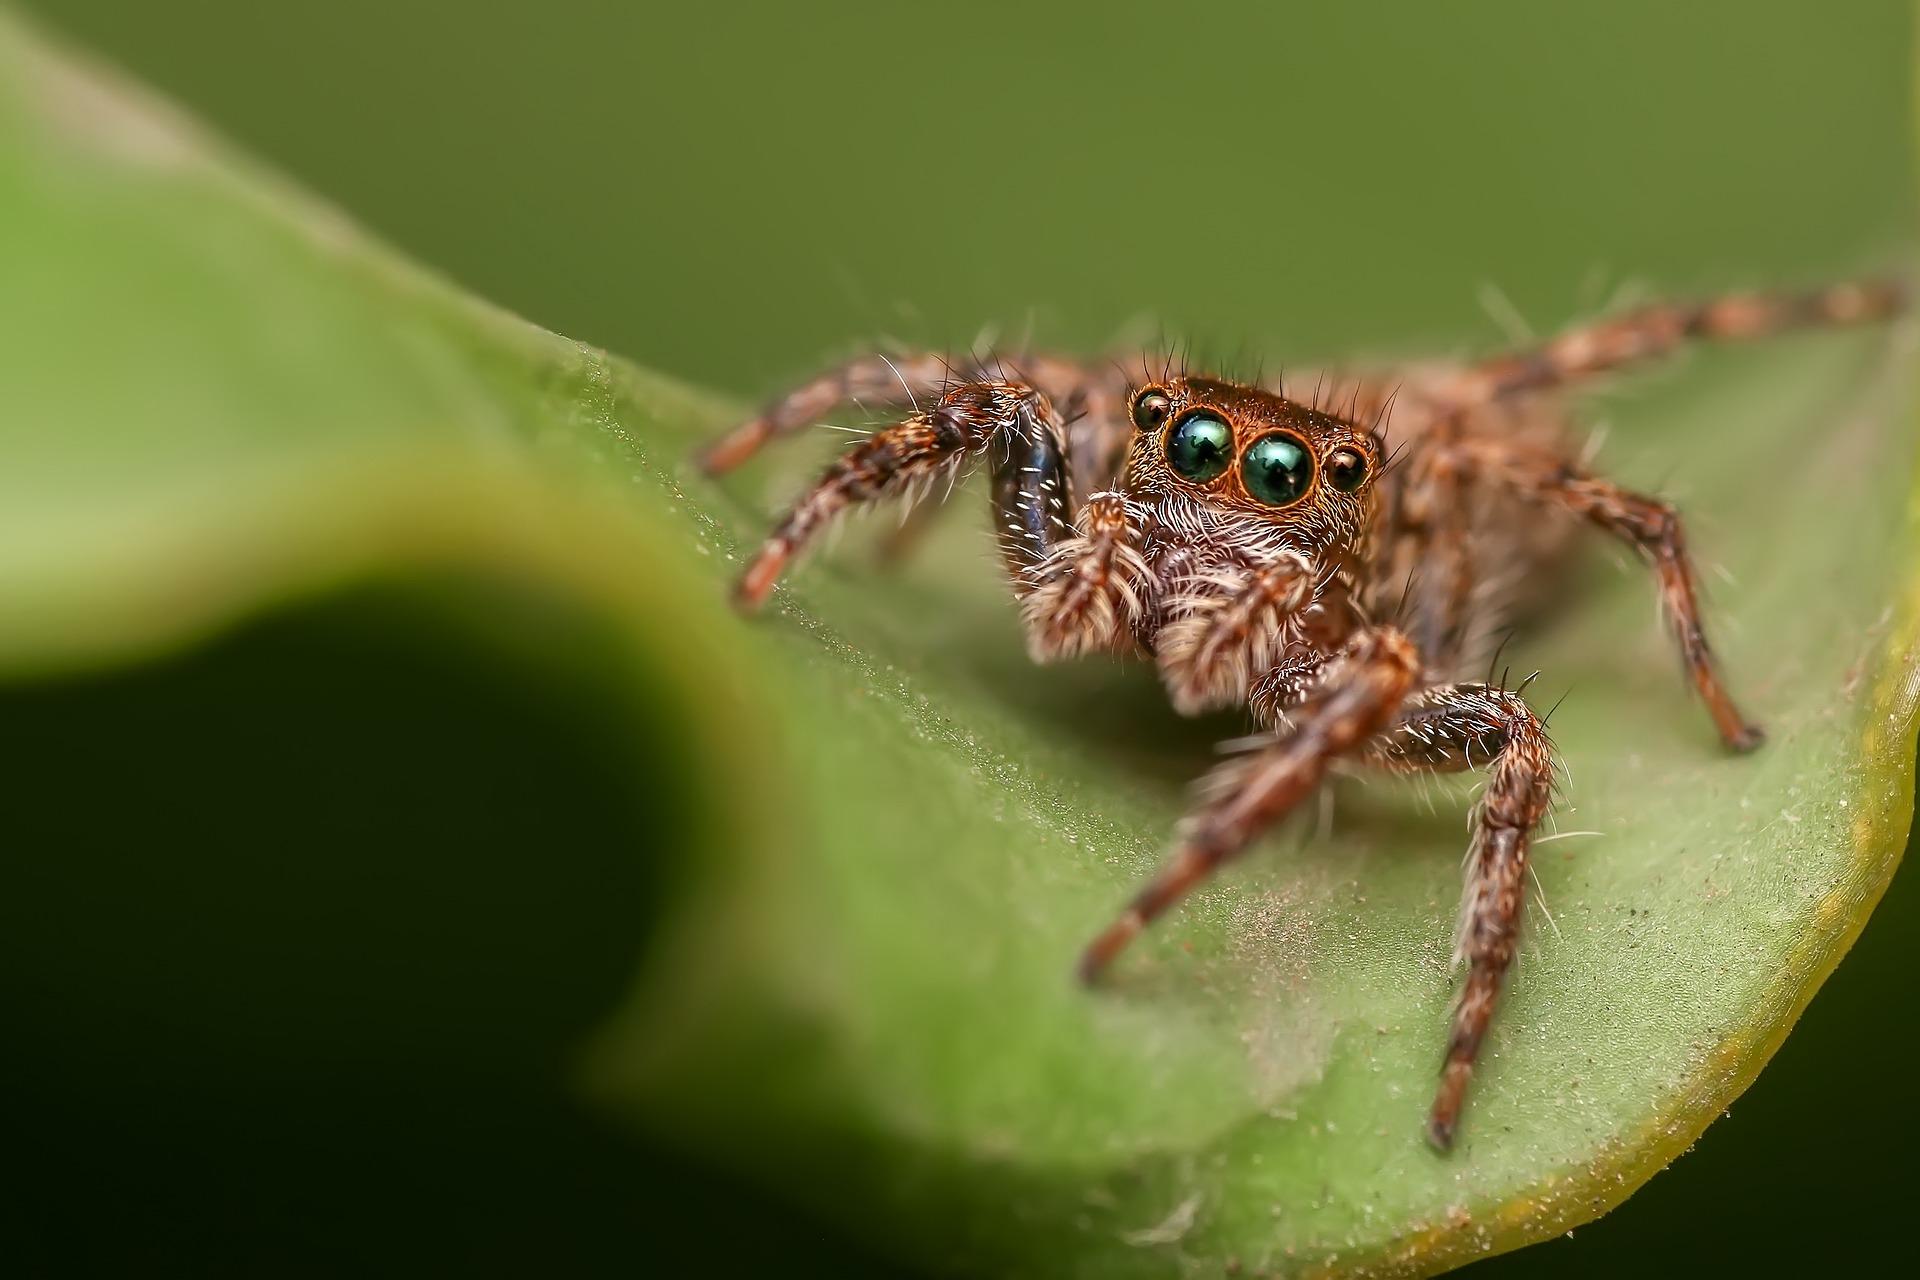 jumping-spider-1153974_1920